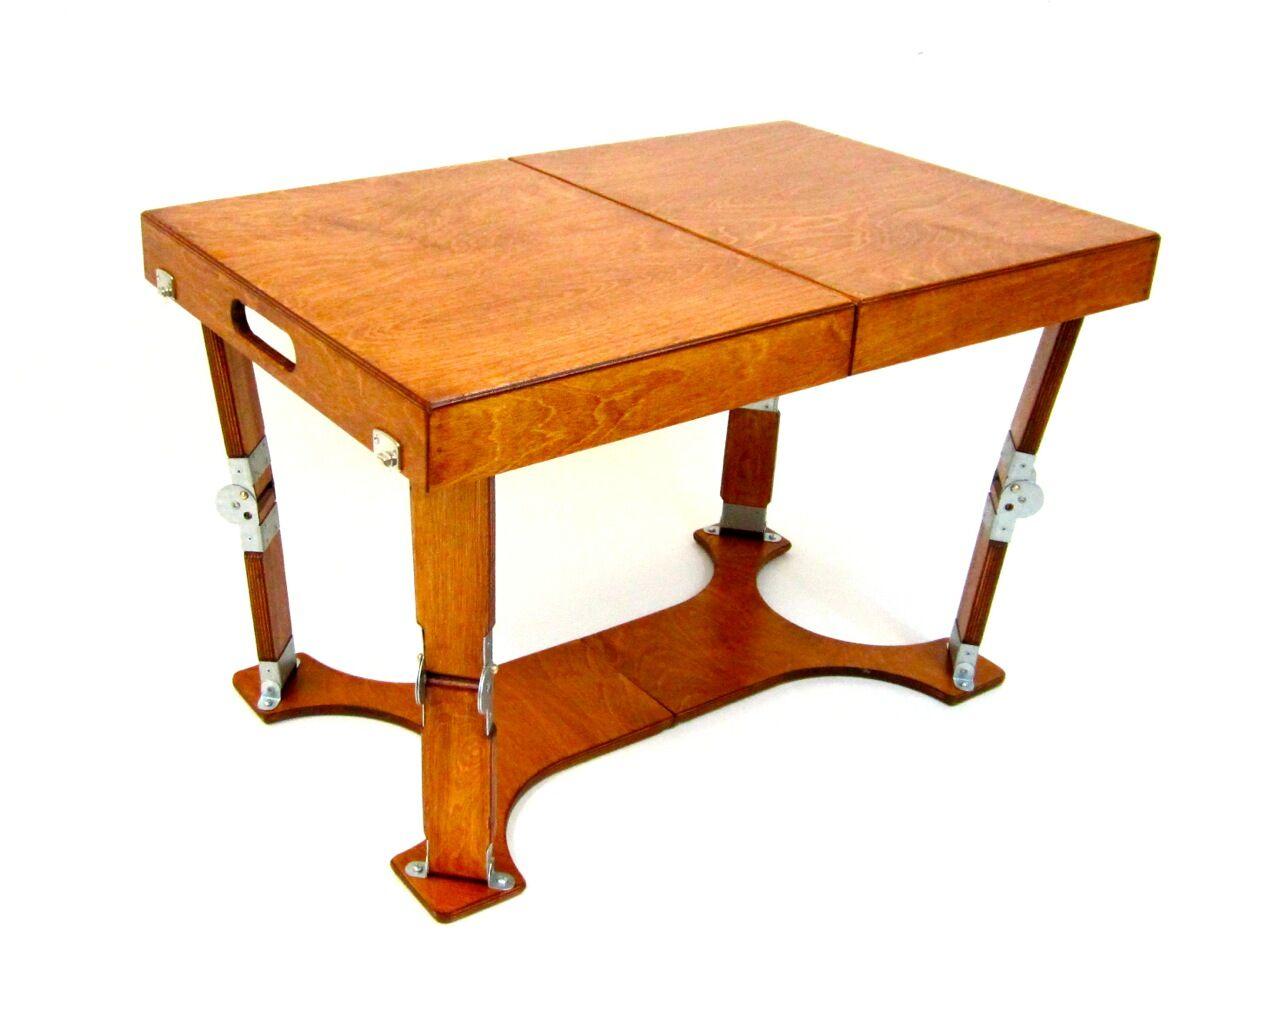 Alpharetta Portable Folding Coffee Table Color: Light Cherry